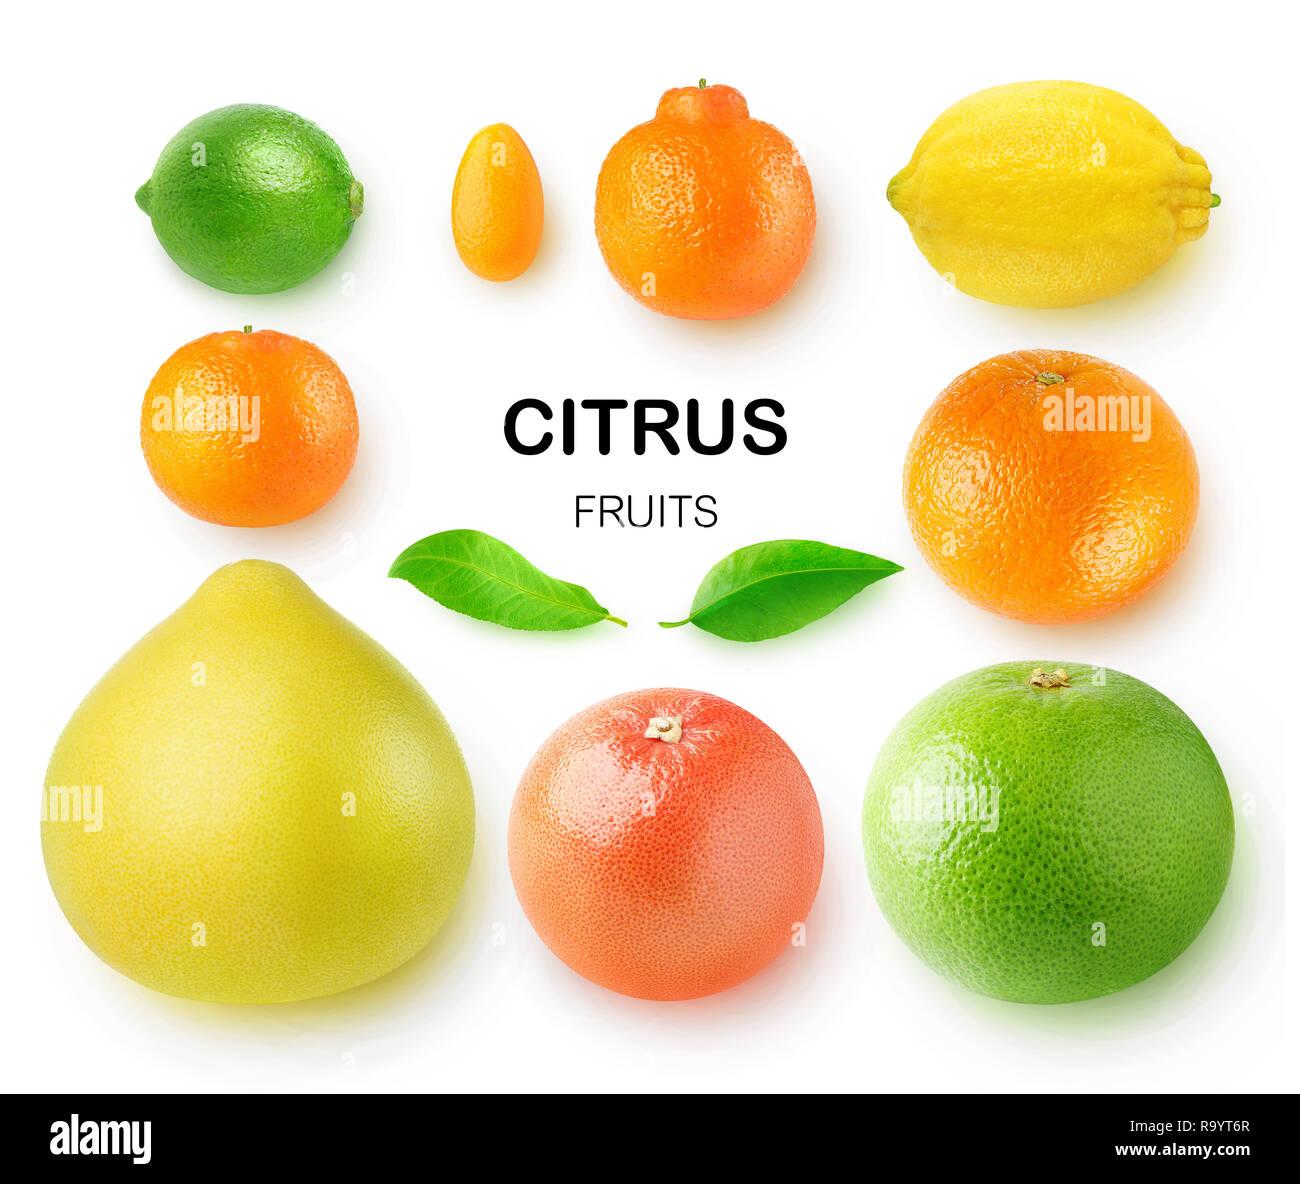 Isolated citrus fruits. Pomelo, grapefruits, orange, lemon, clementine, kumquat, lime and mandarin isolated on white background with clipping path - Stock Image